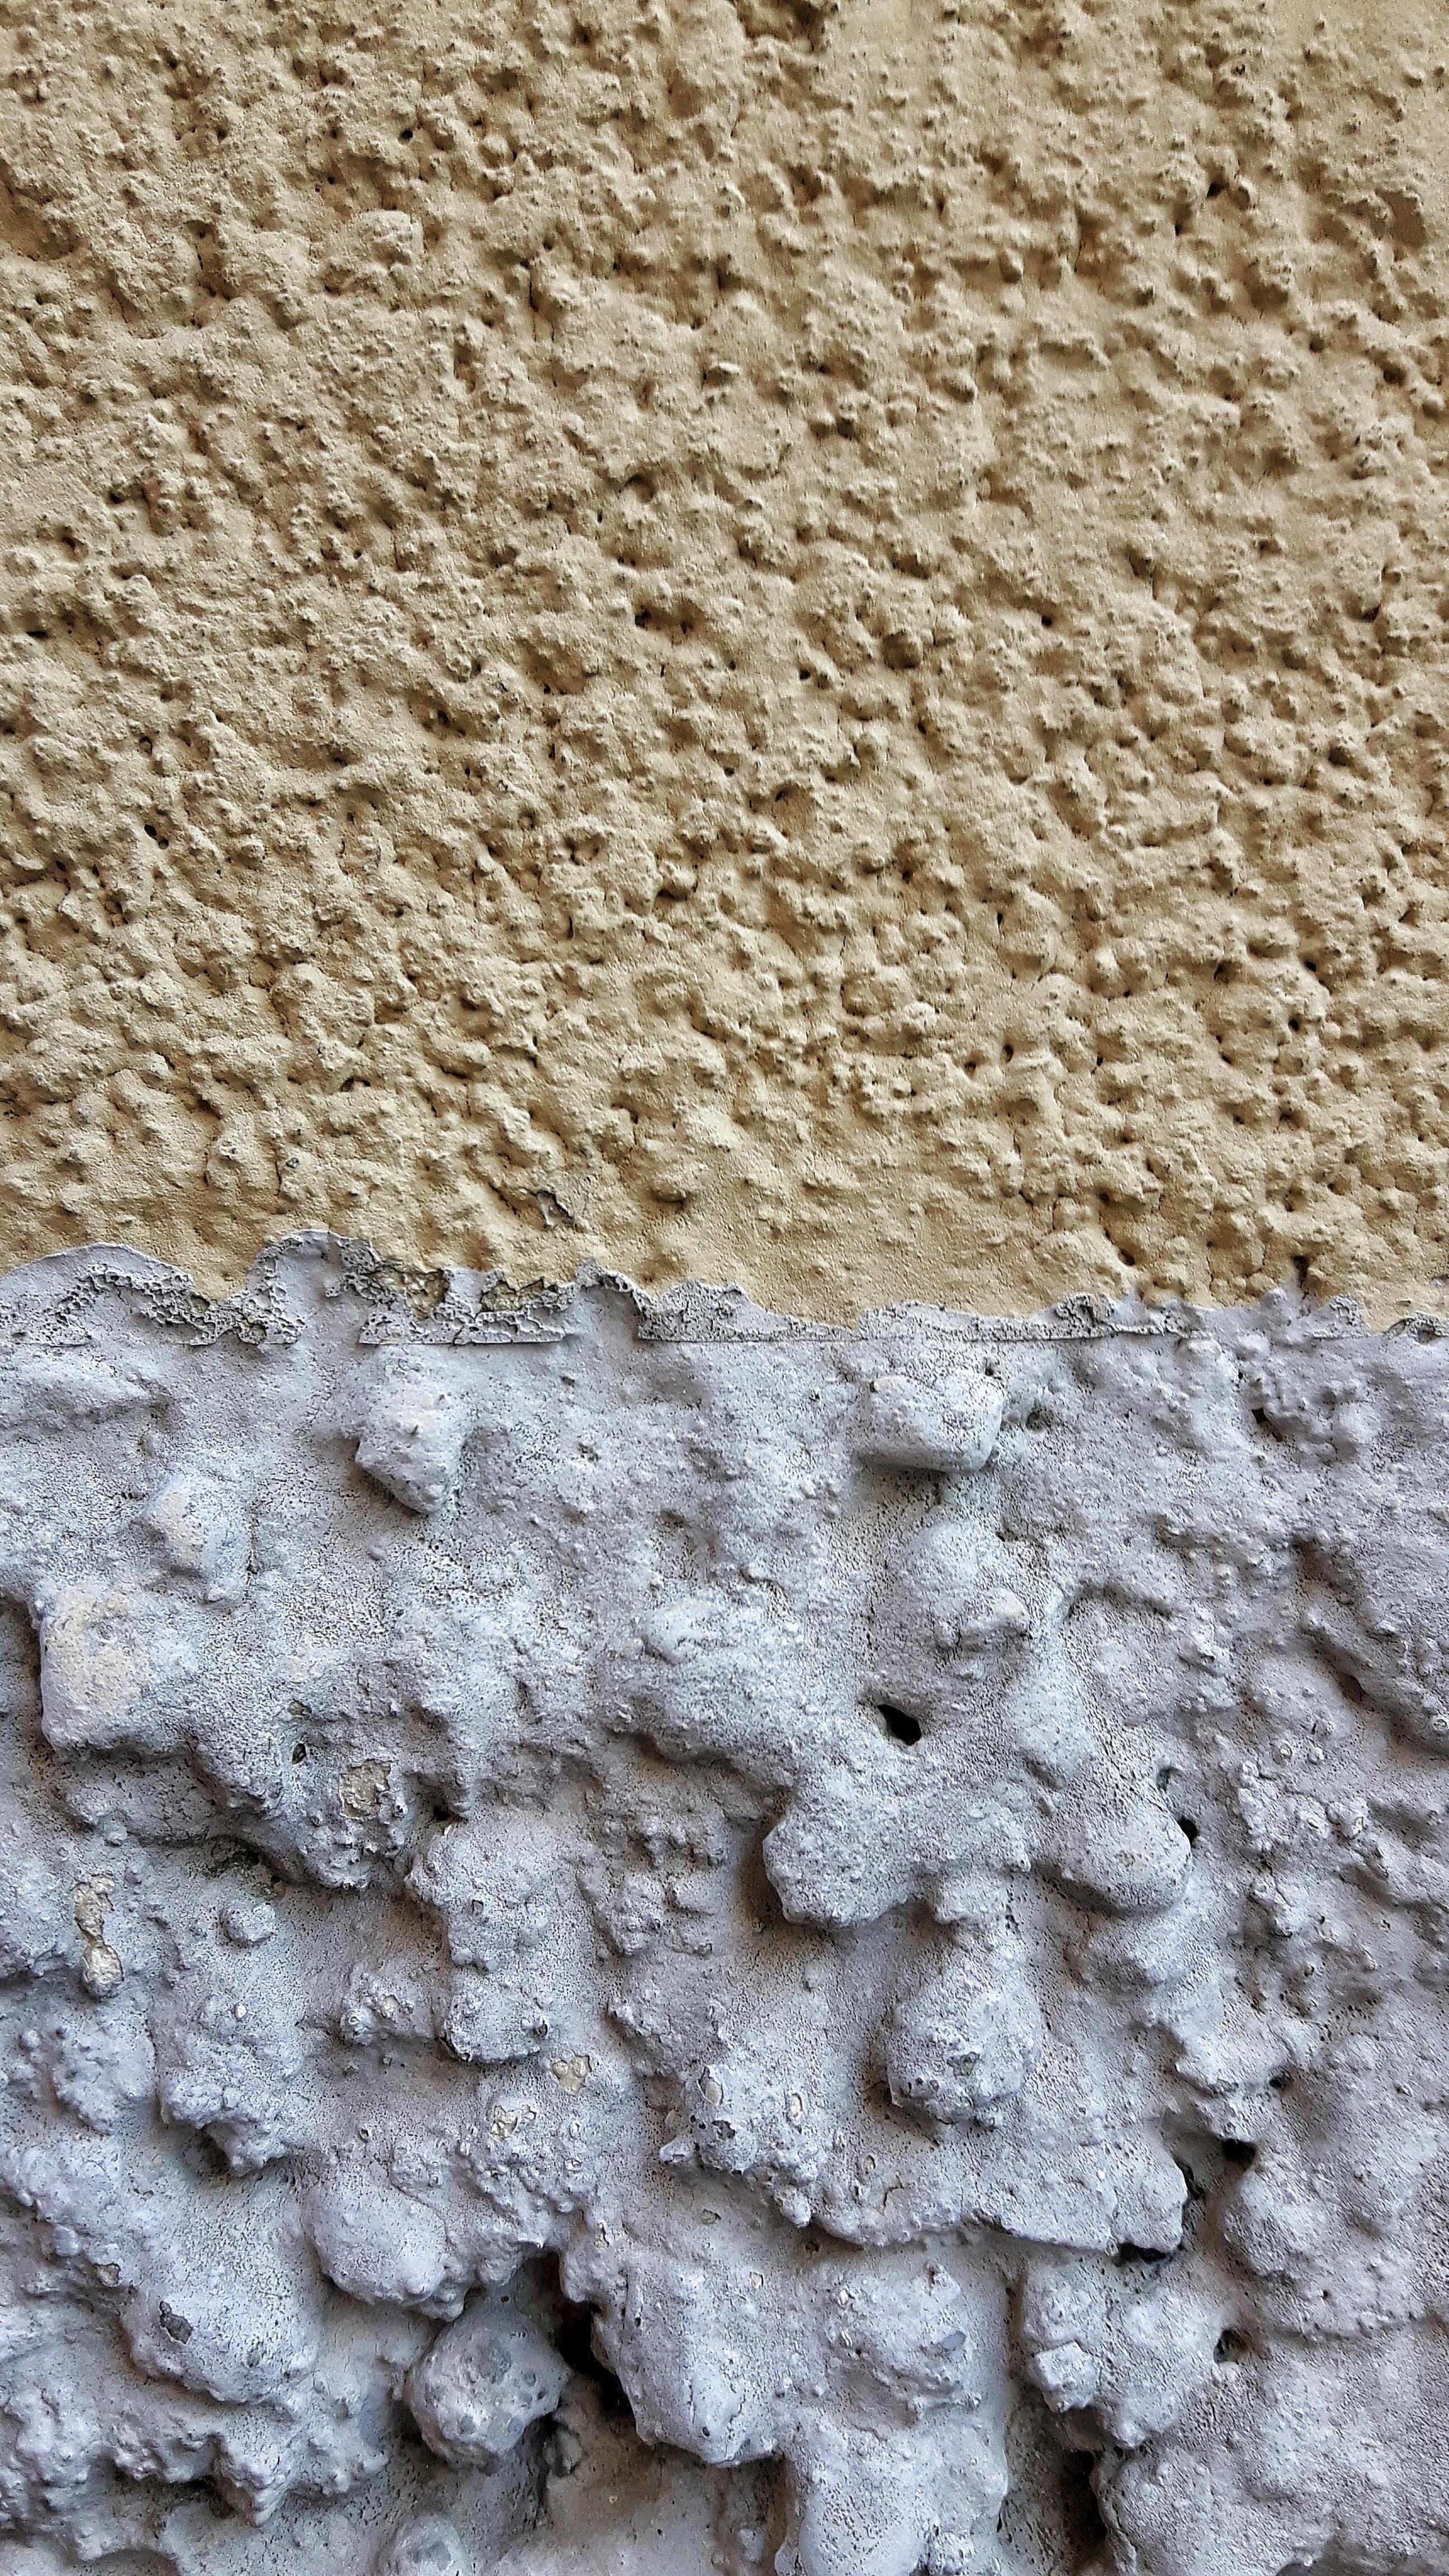 Fotos gratis : arena, rock, madera, textura, pared, color, suelo ...